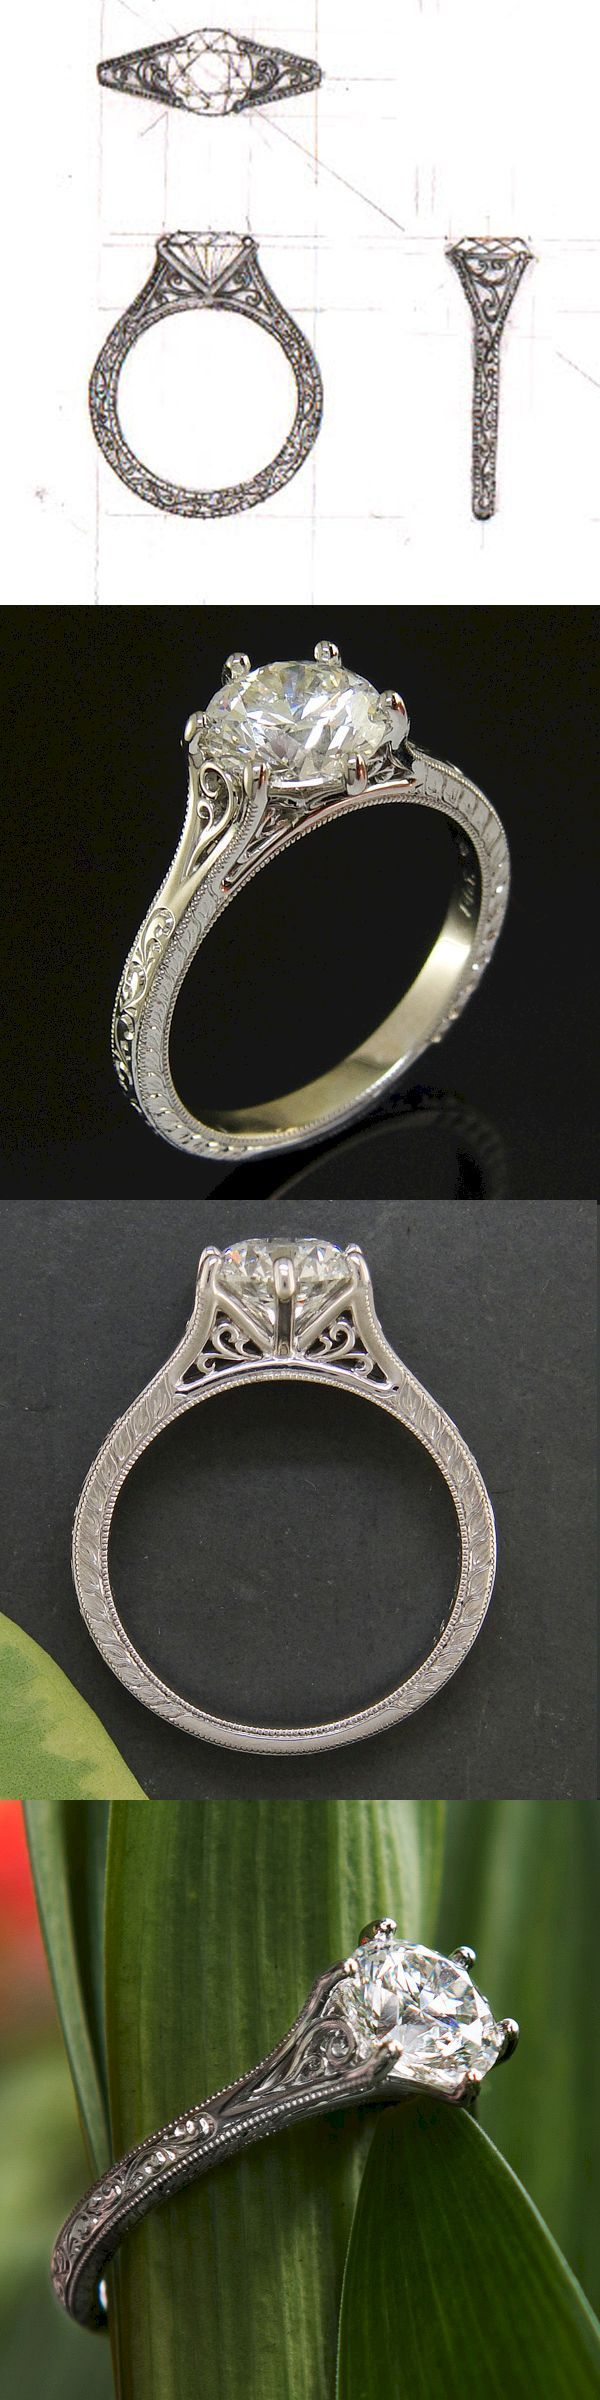 breathtaking vintage engagement rings inspirations engagement